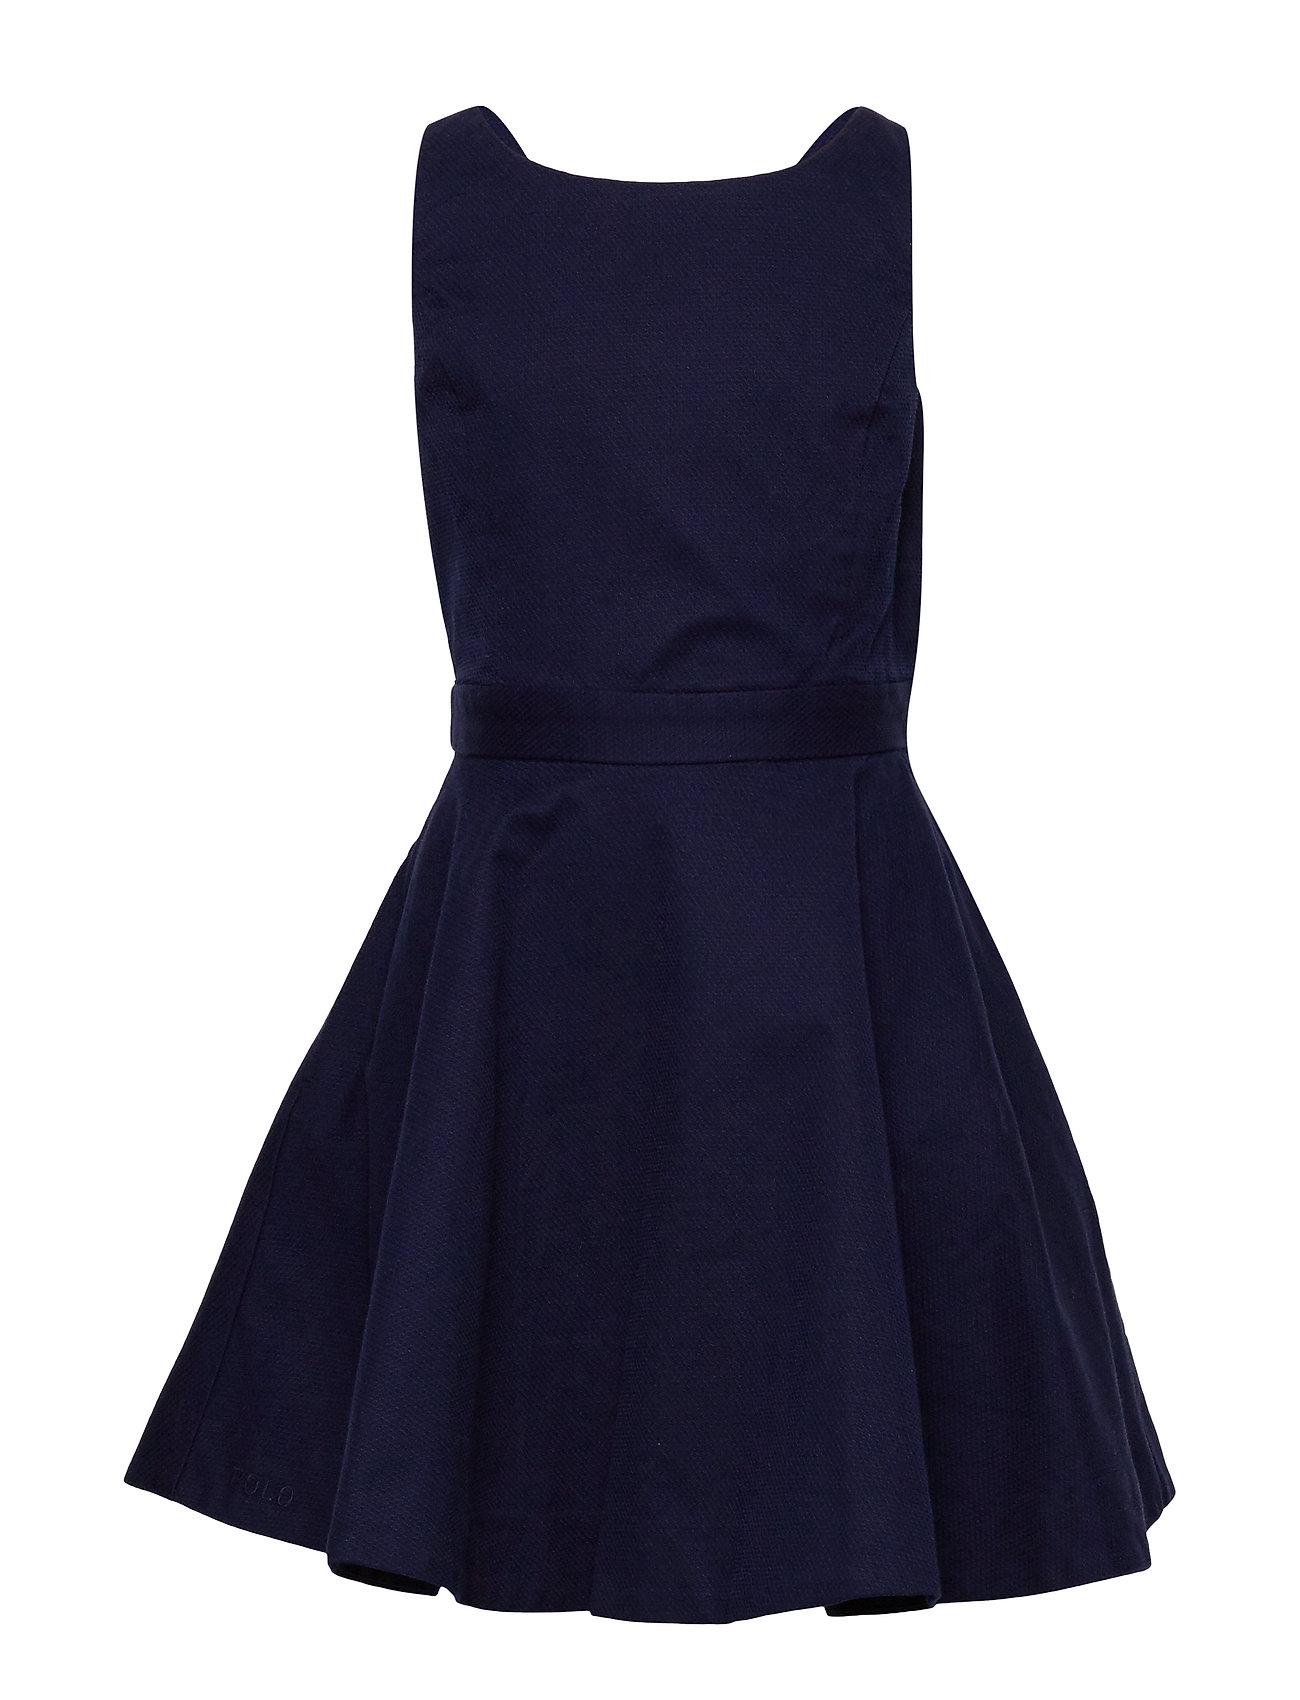 Ralph Lauren Kids Crossback Stretch Cotton Dress - FRENCH NAVY